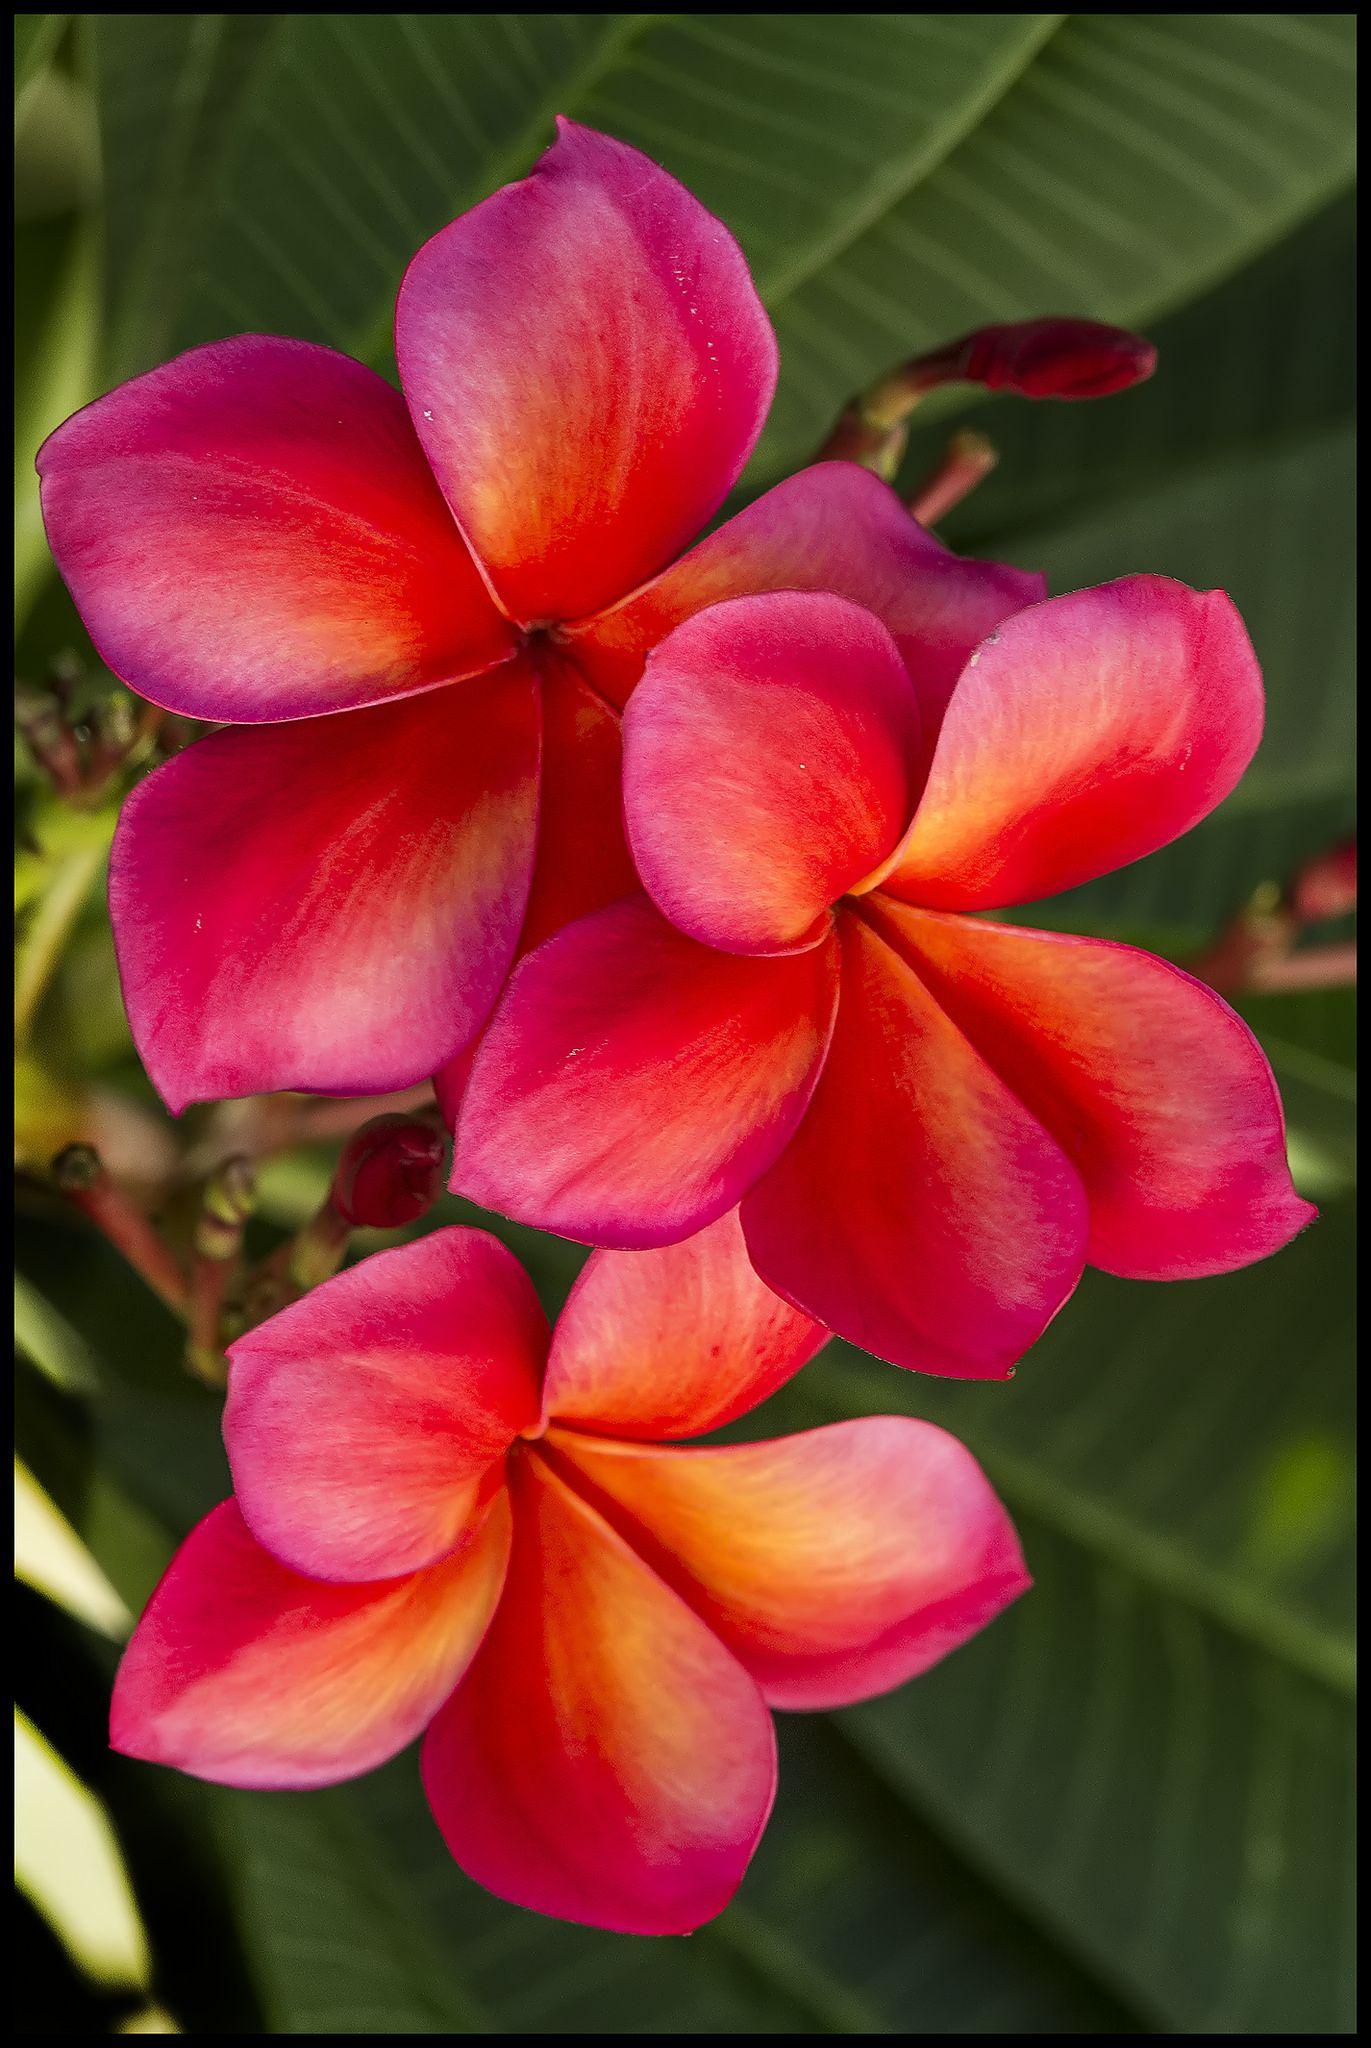 Red Frangipani 1 Flowers Plumeria Flowers Planting Flowers